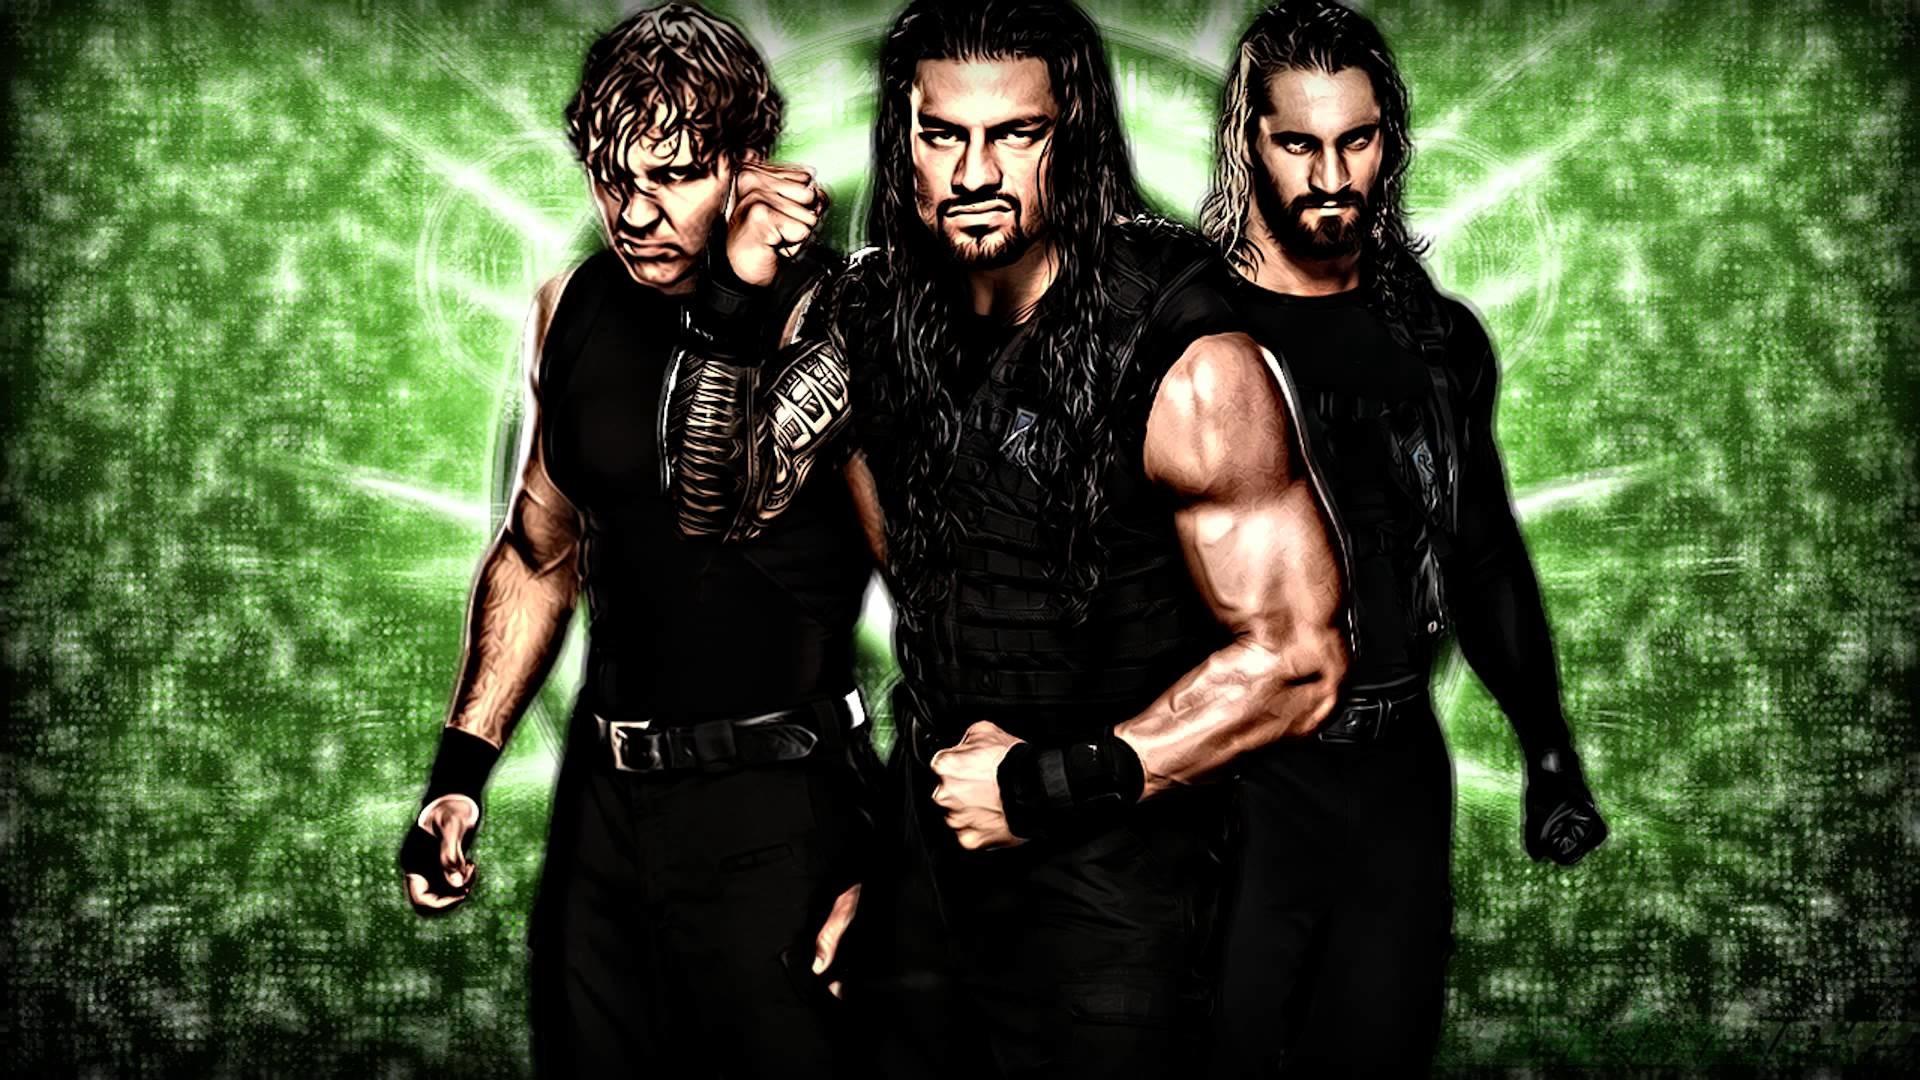 WWE HD Wallpaper Free The Shield Hd Wallpapers Free Download